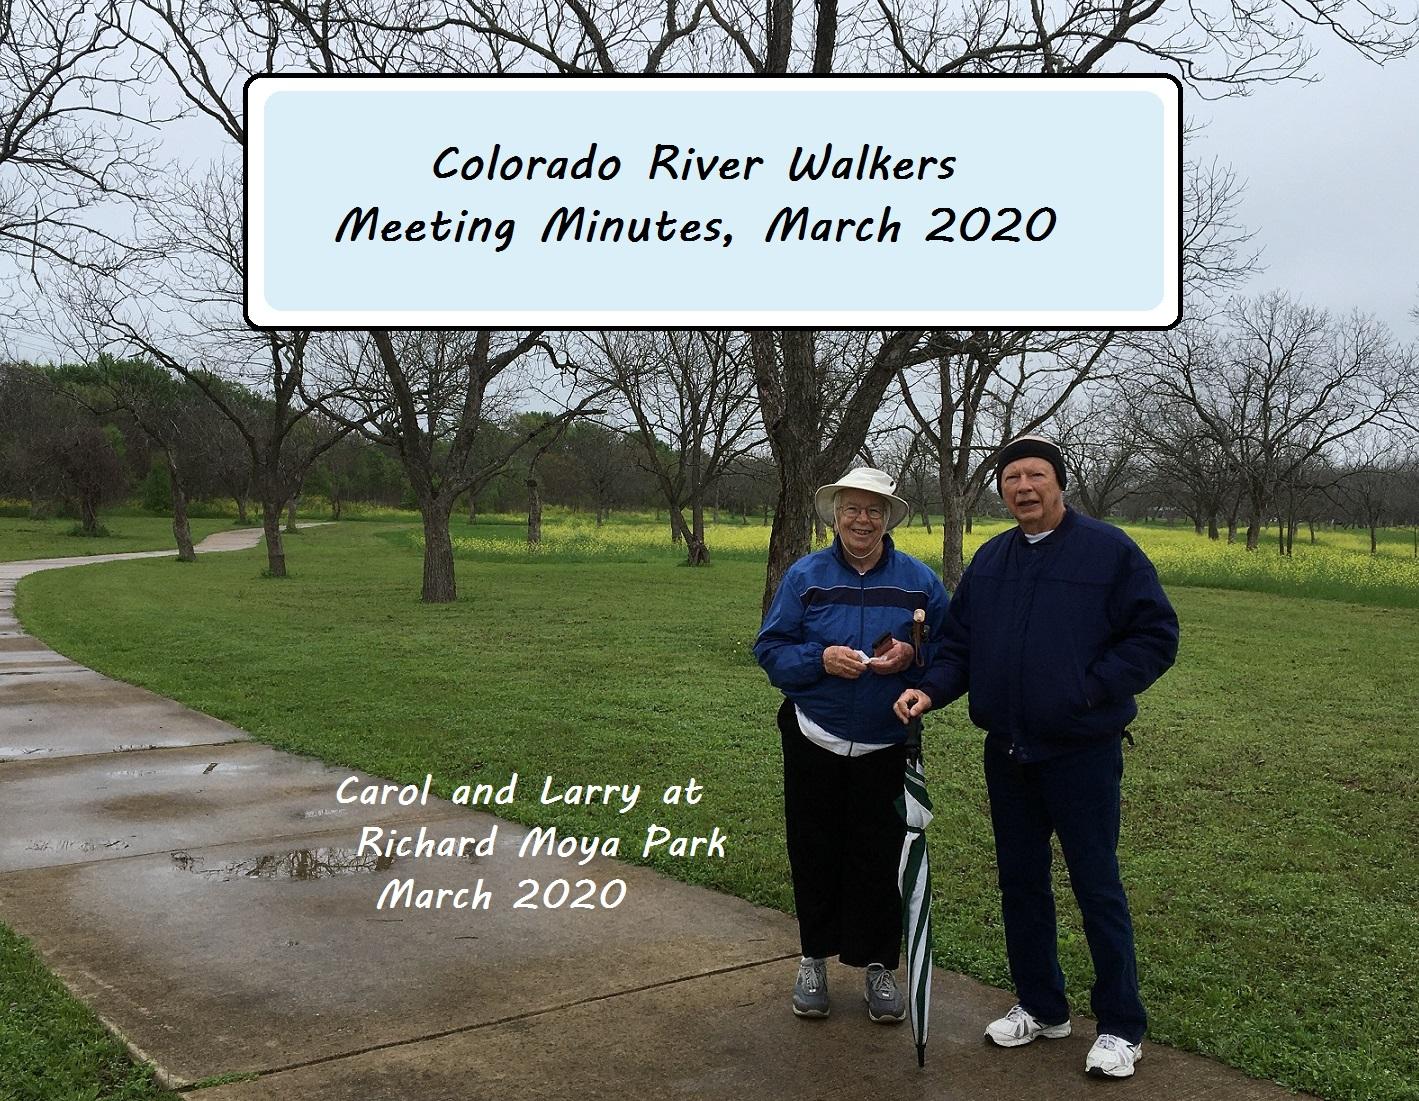 Meeting Minutes Mar 2020